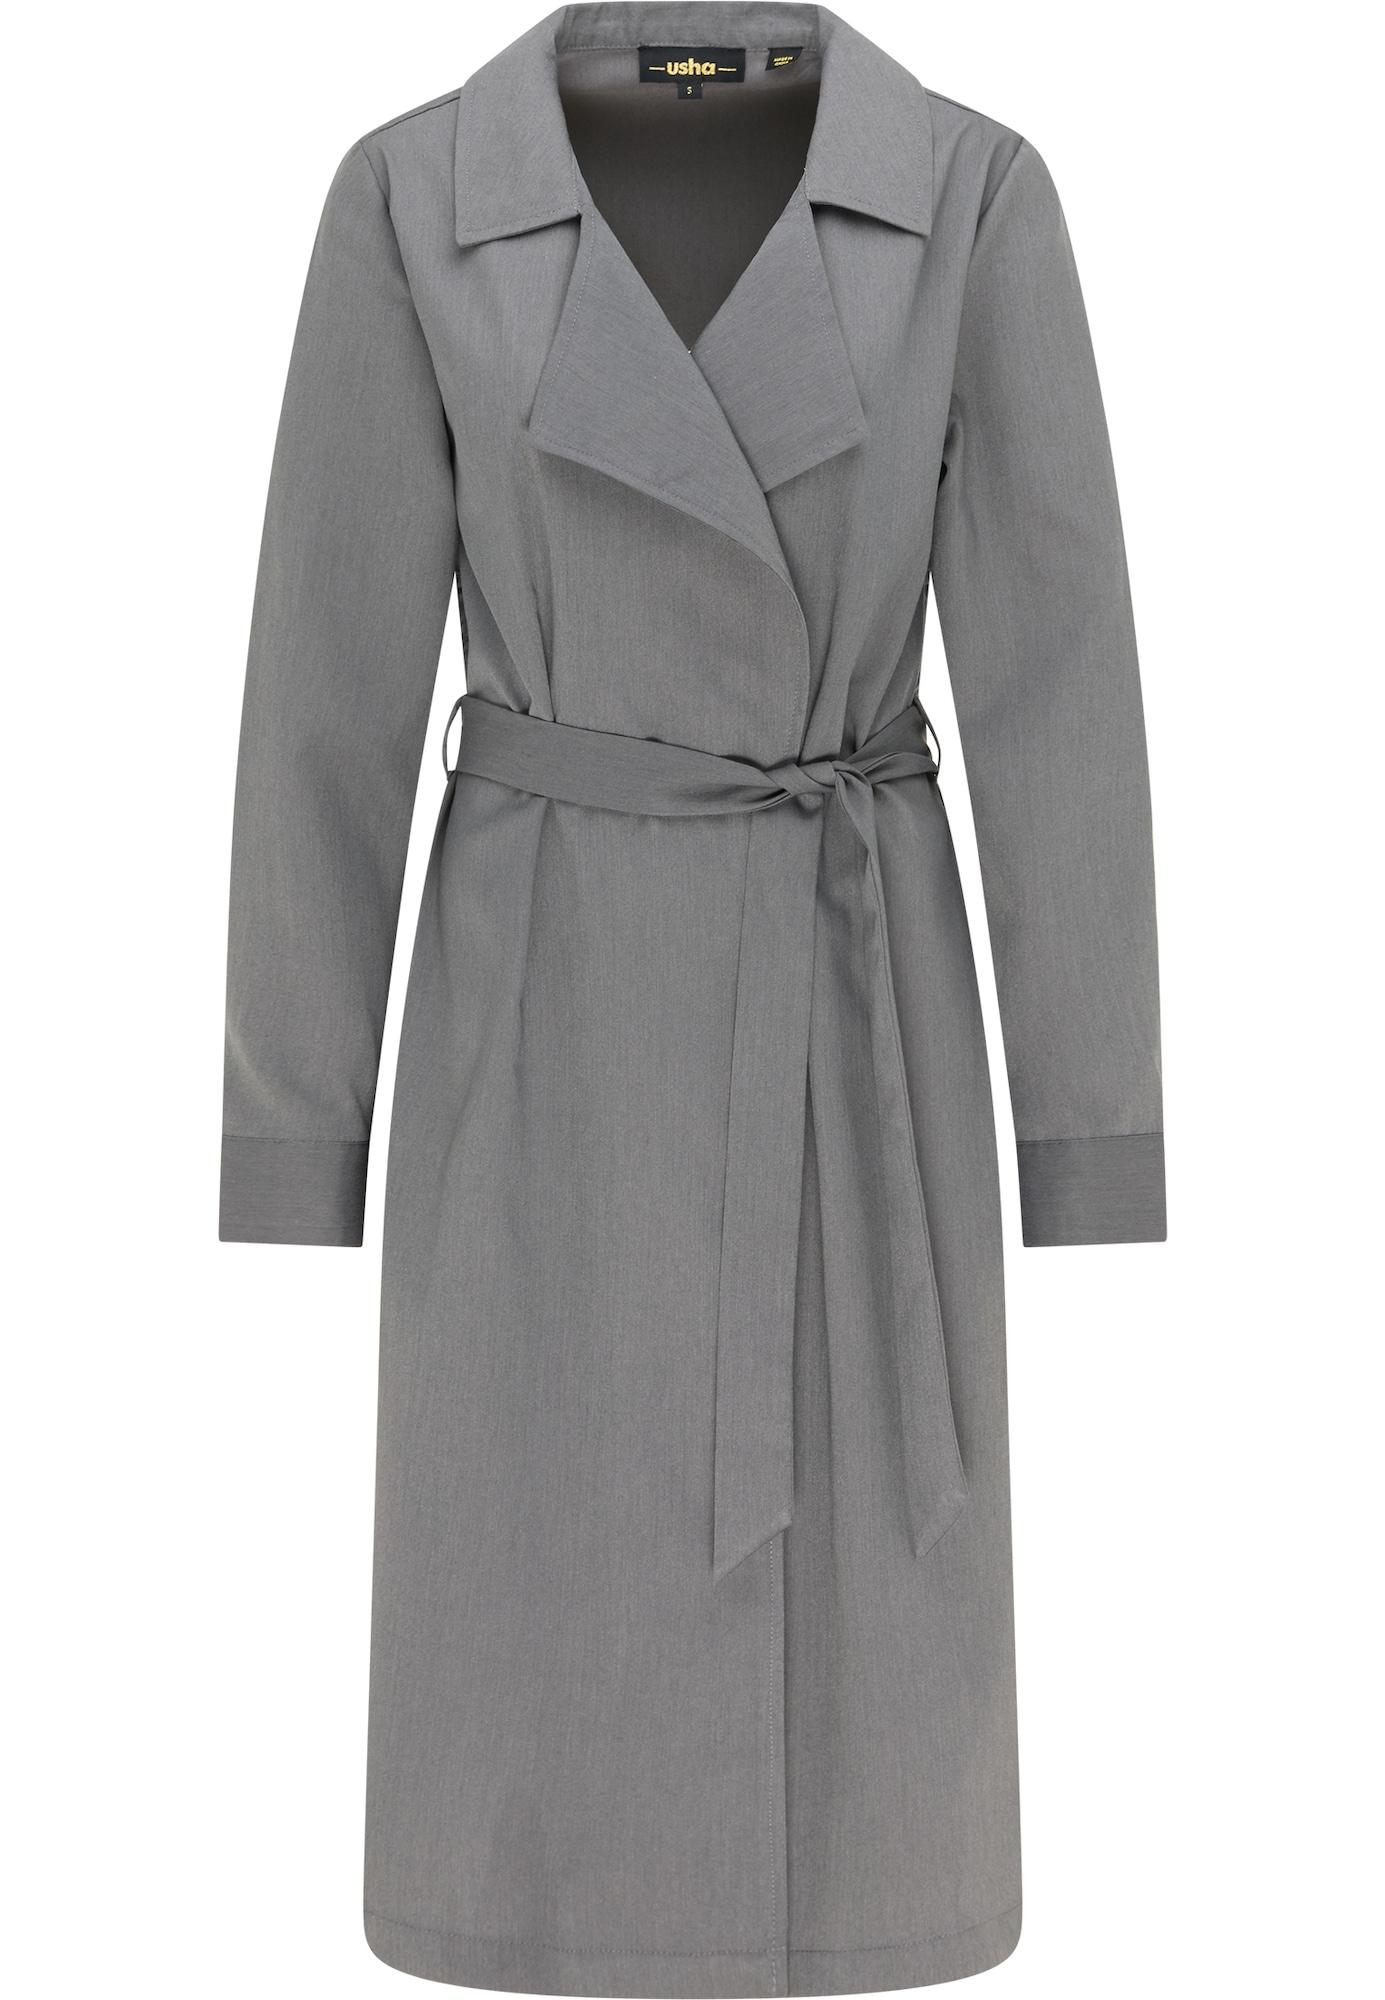 usha BLACK LABEL Demisezoninis paltas pilka